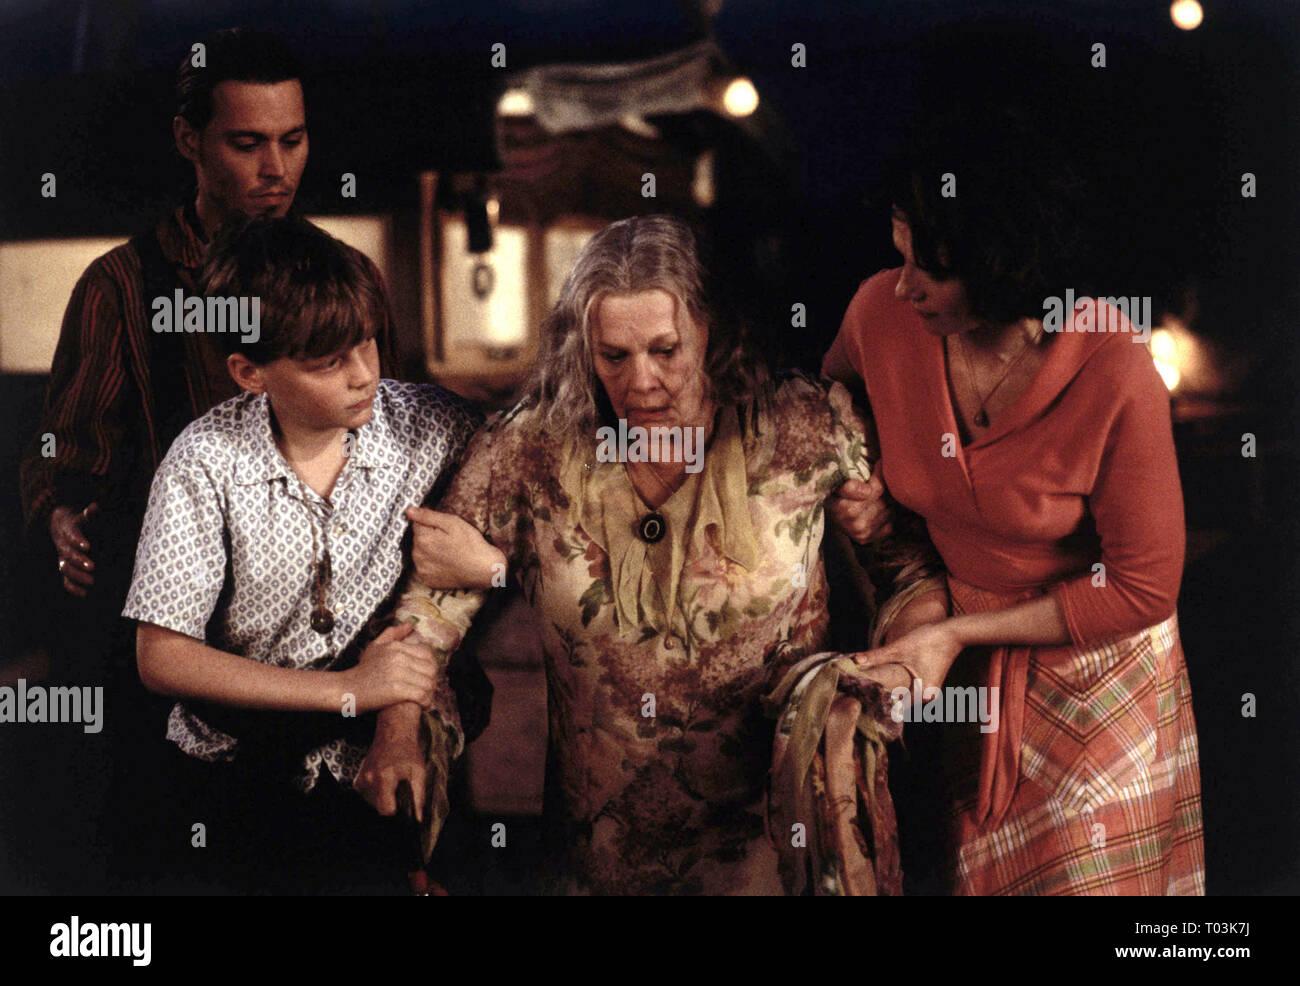 JOHNNY DEPP, AURELIEN PARENT KOENIG, JUDI DENCH, JULIETTE BINOCHE, CHOCOLAT, 2000 - Stock Image